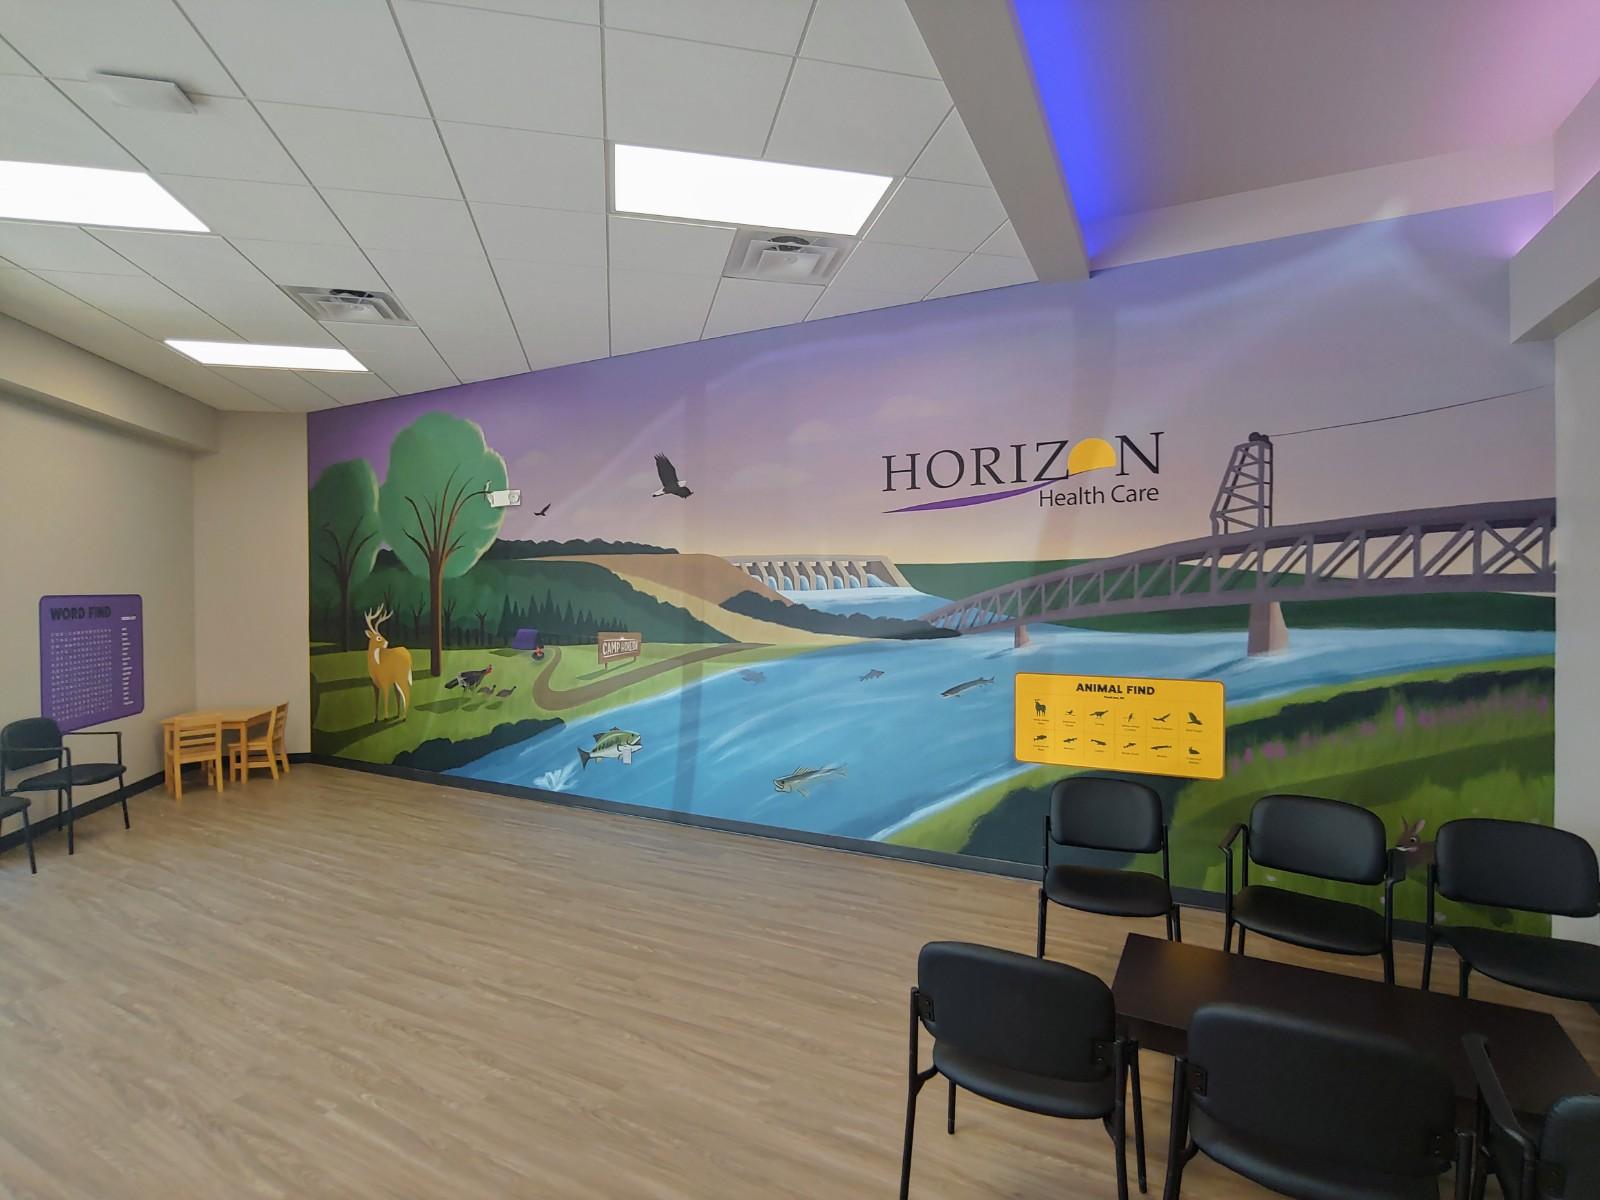 hhc mural